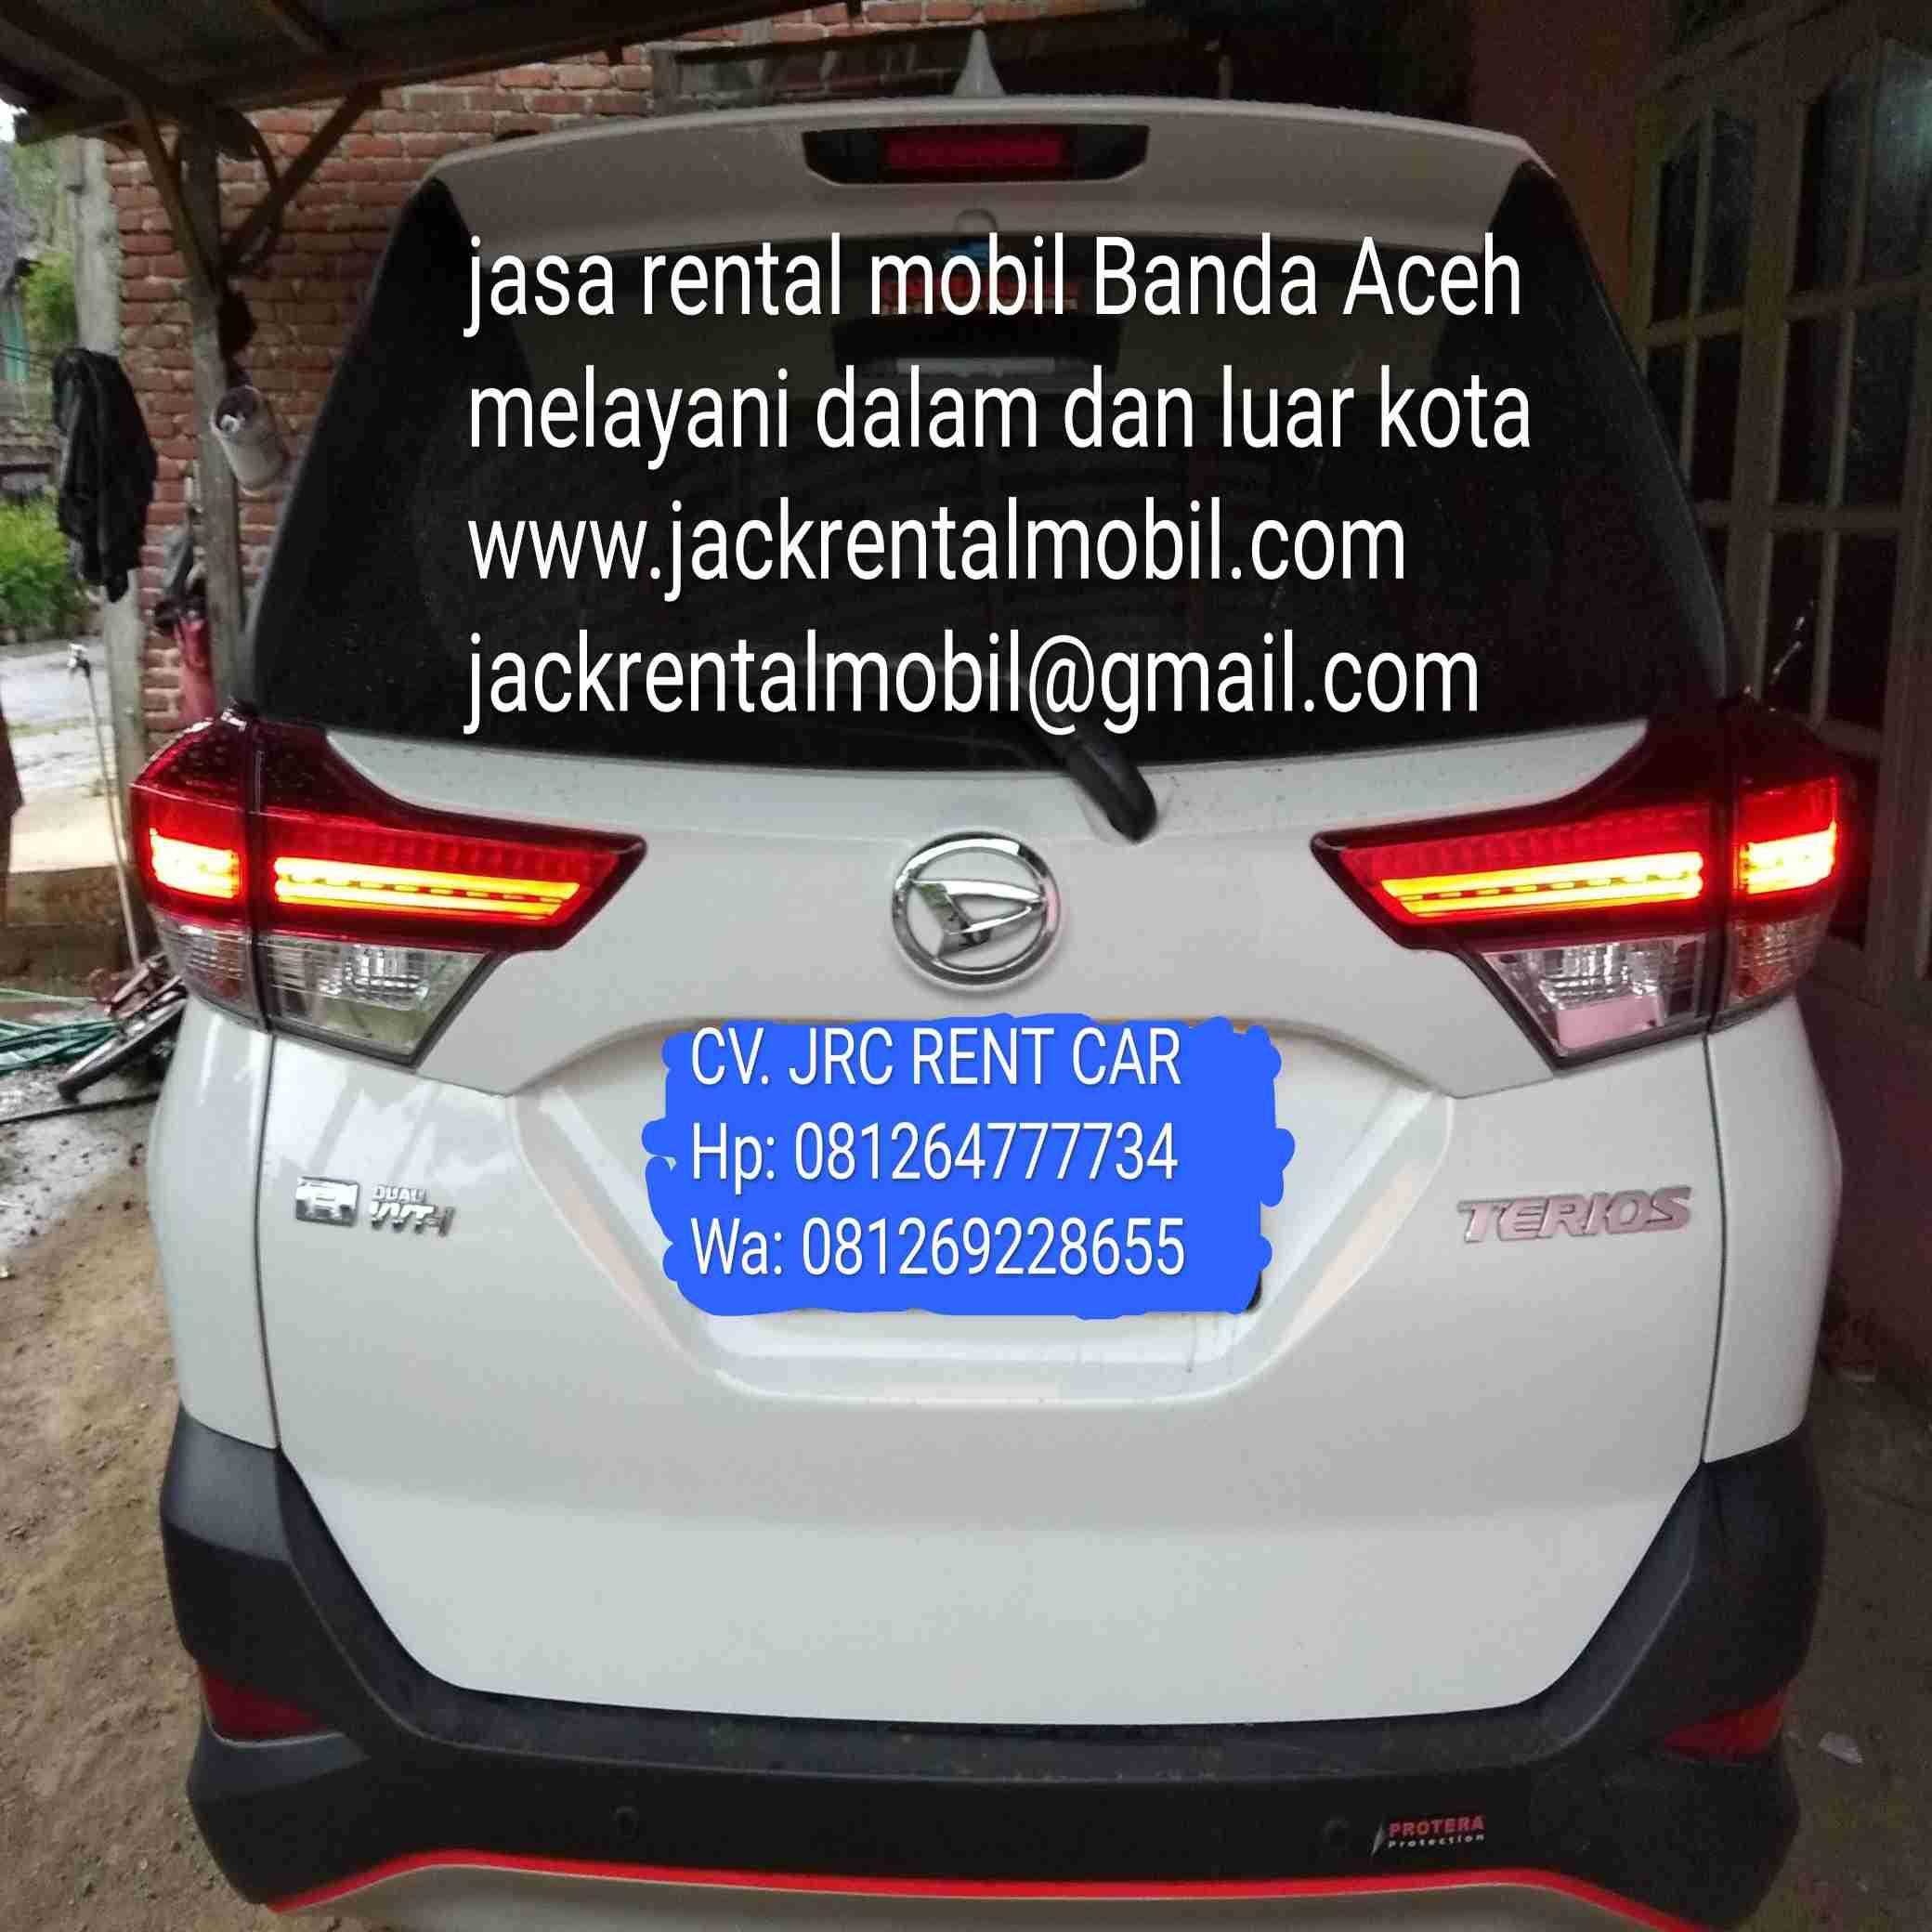 CV JRC RENT CAR jasa rental mobil di Banda Aceh